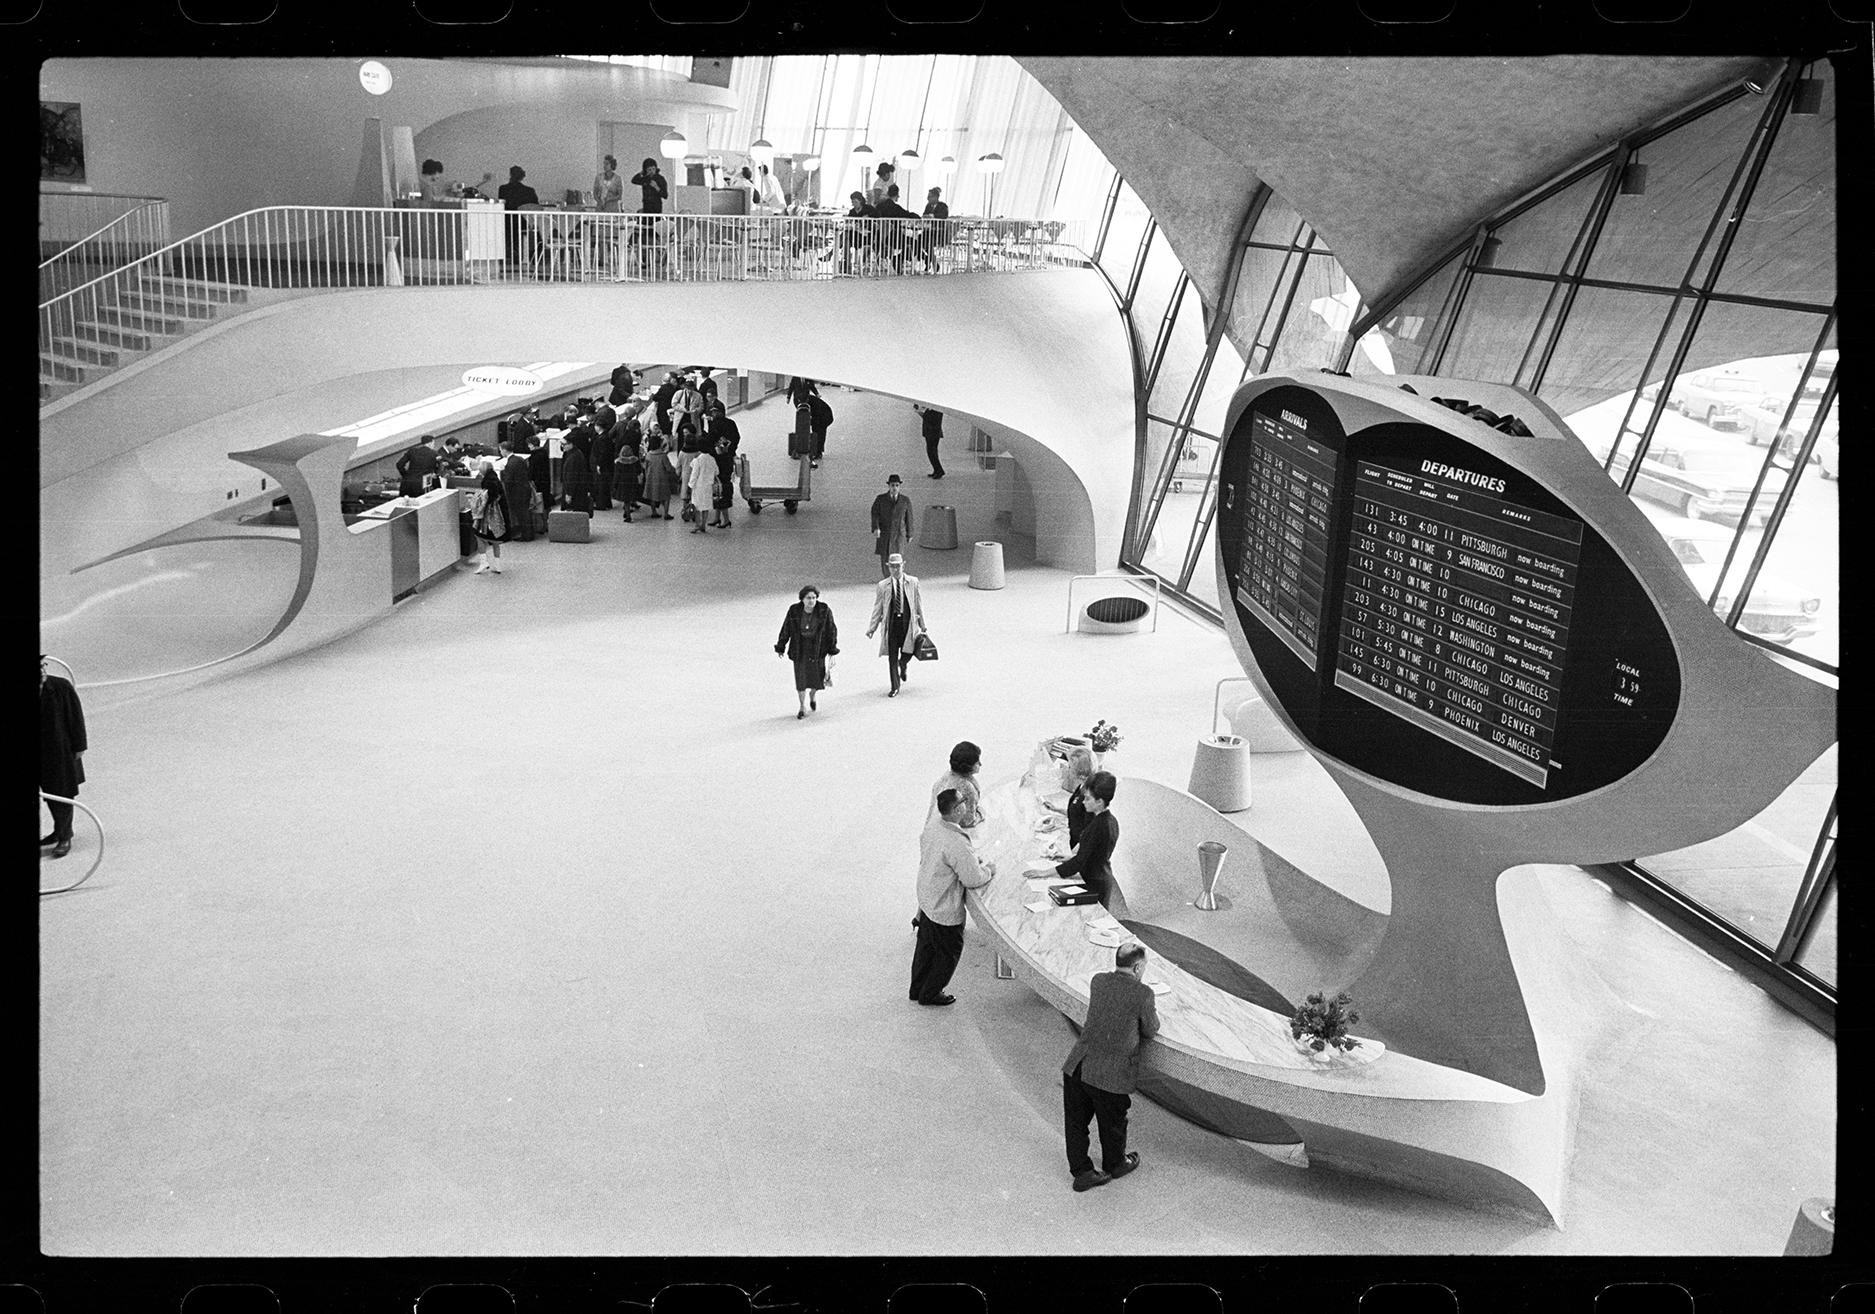 travelers walk through an airport